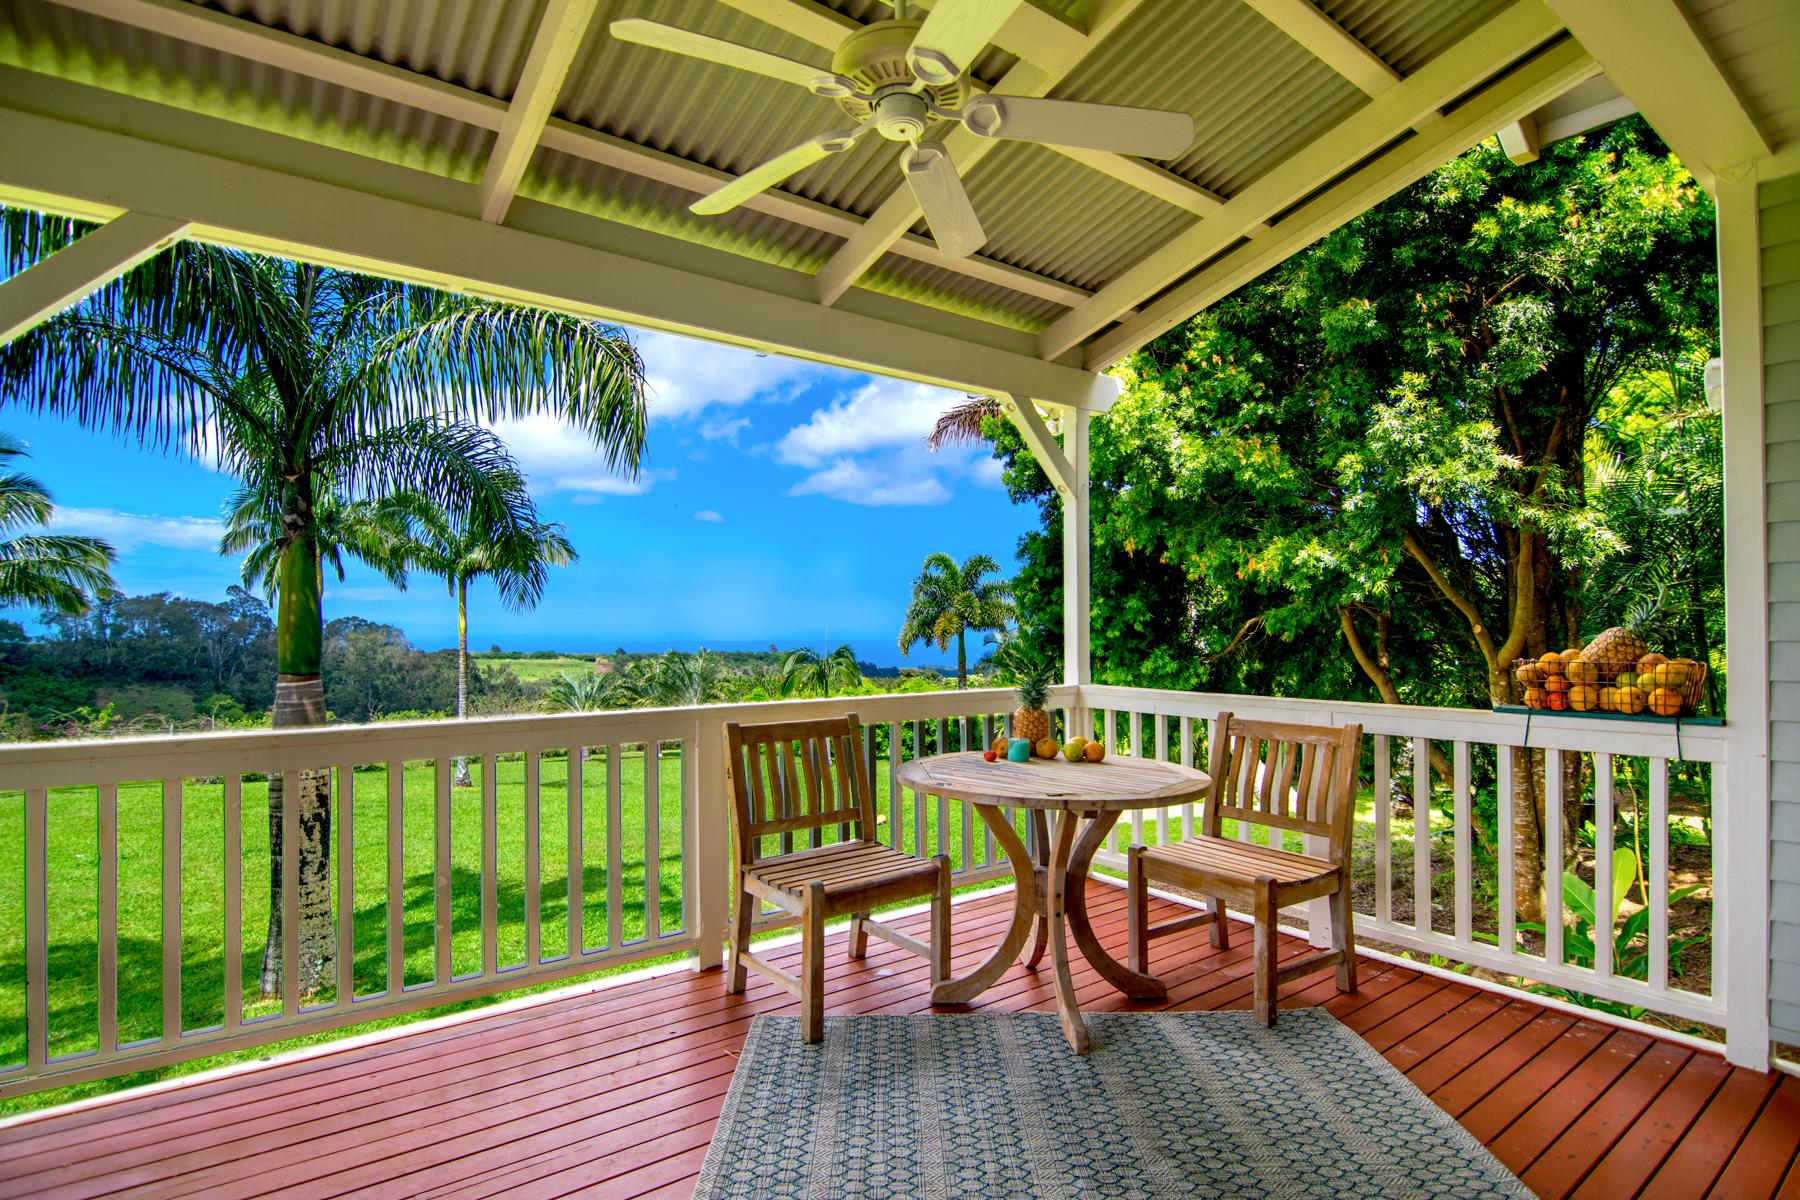 Moradia para Venda às Architect's Ocean-View, Private Dream Home 100 Laenani Street Haiku, Havaí, 96708 Estados Unidos